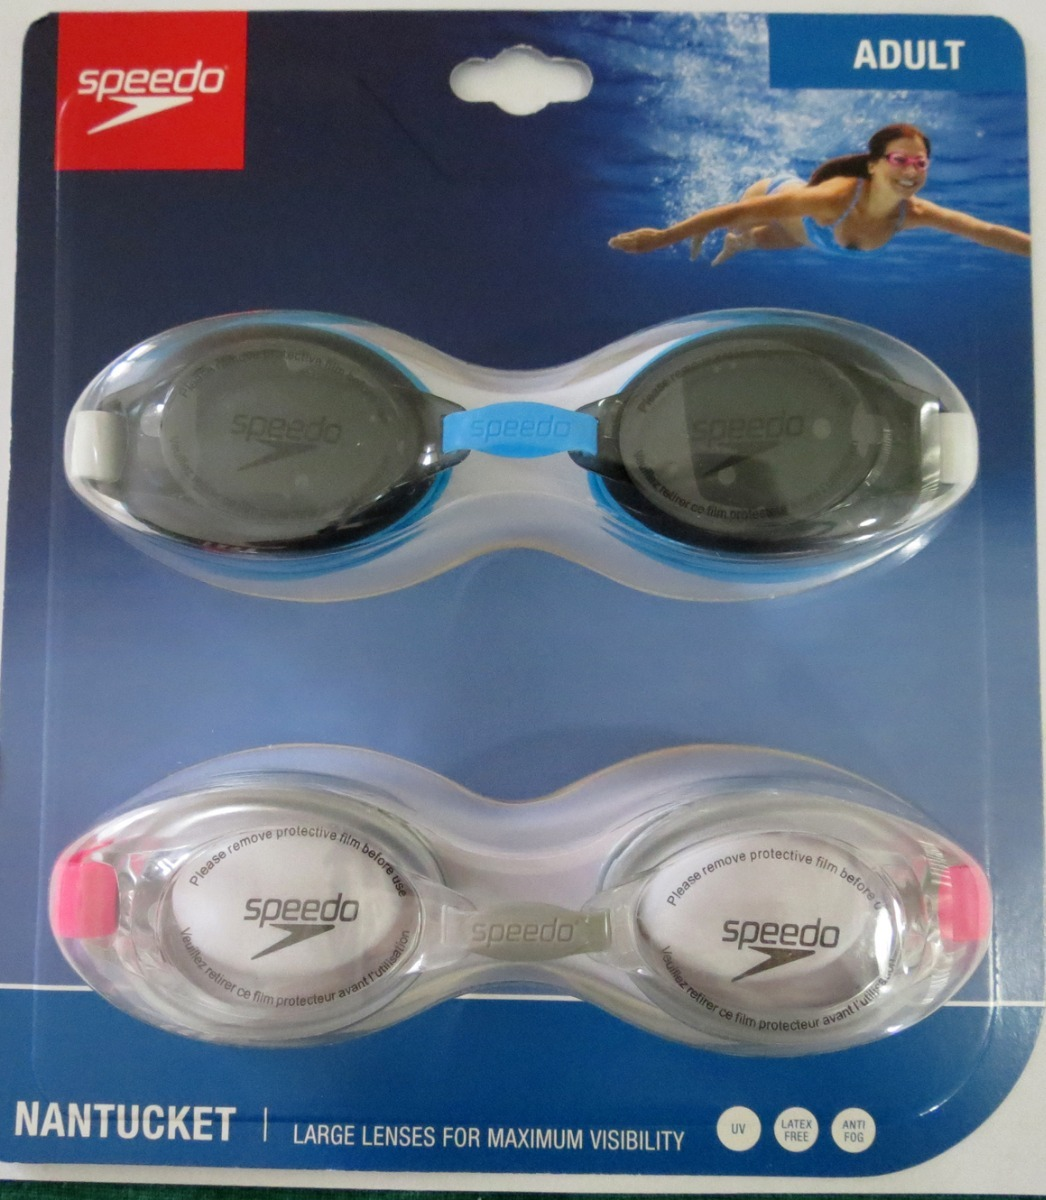 Gafas De Natacion Speedo Nantucket X 2 Adulto -   69.900 en Mercado ... b57ddbd5838